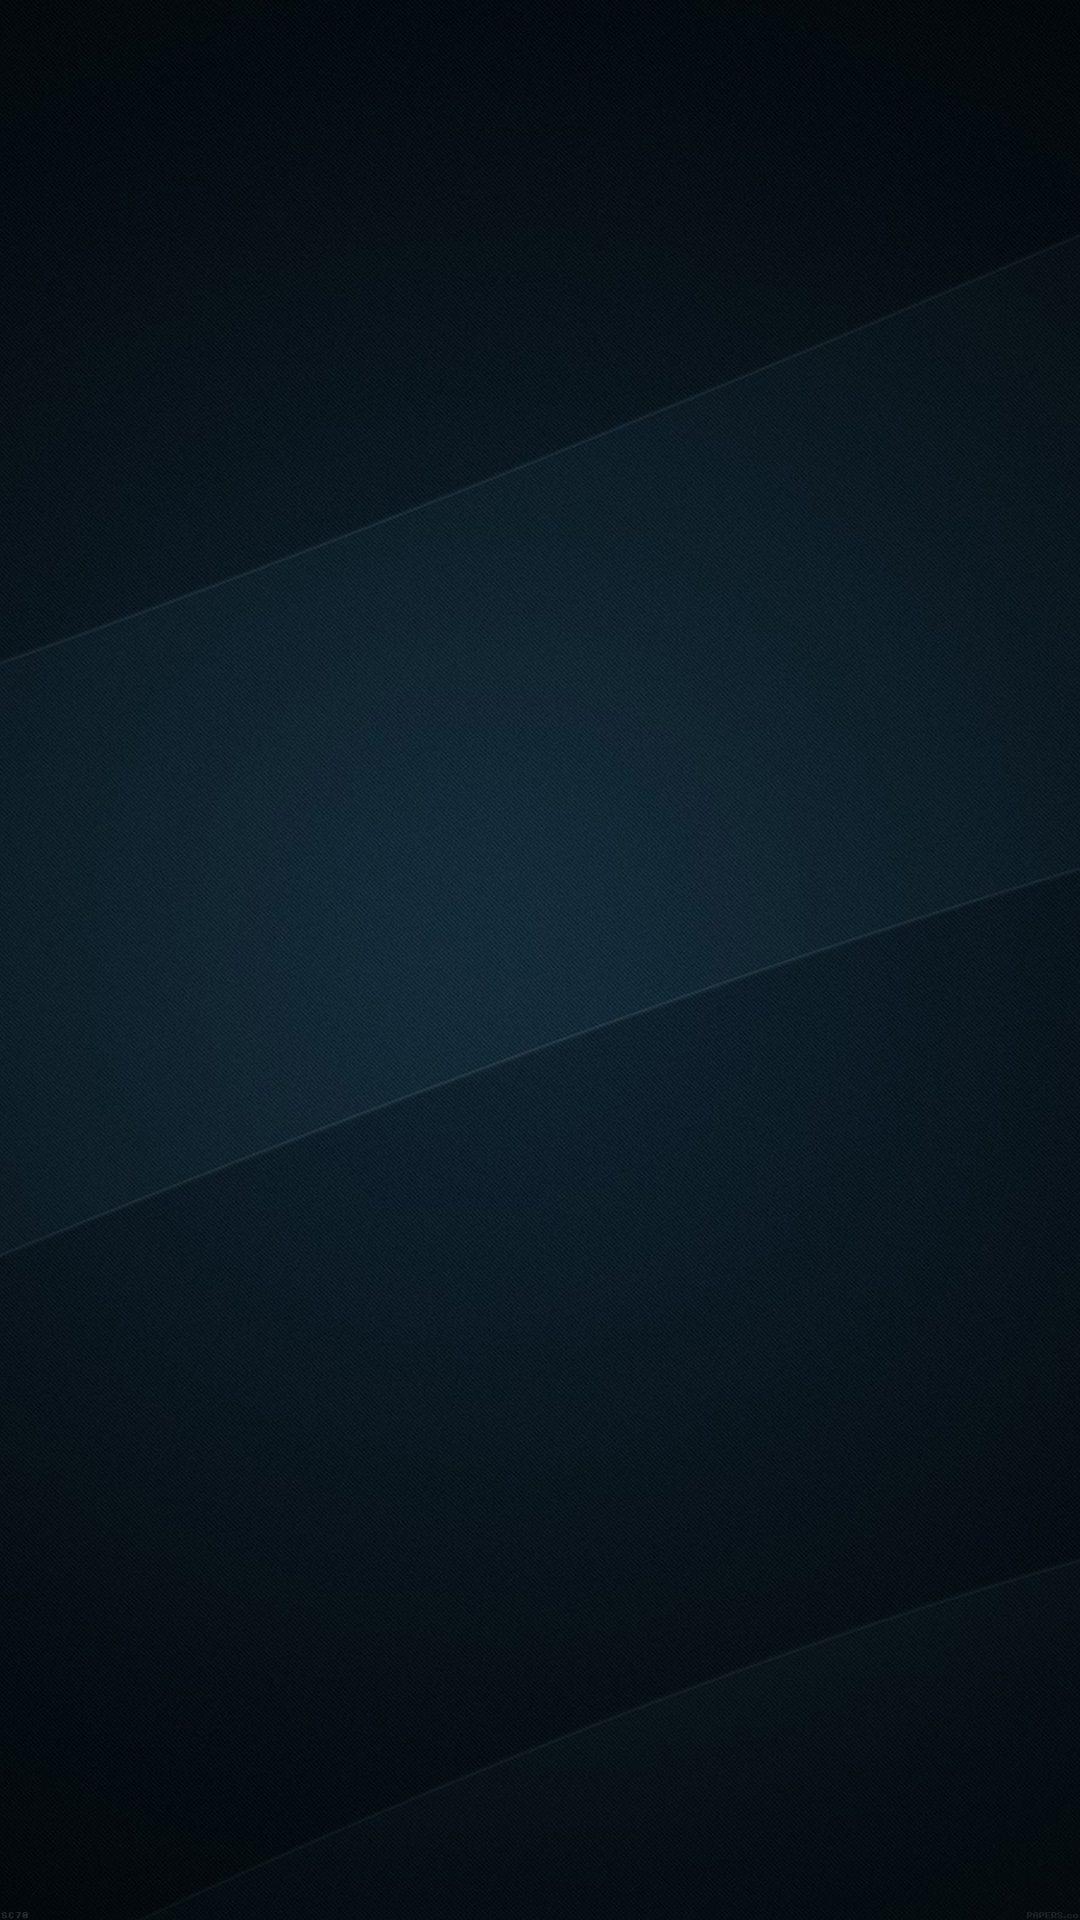 Dark Line Abstract Digital Graphic Art